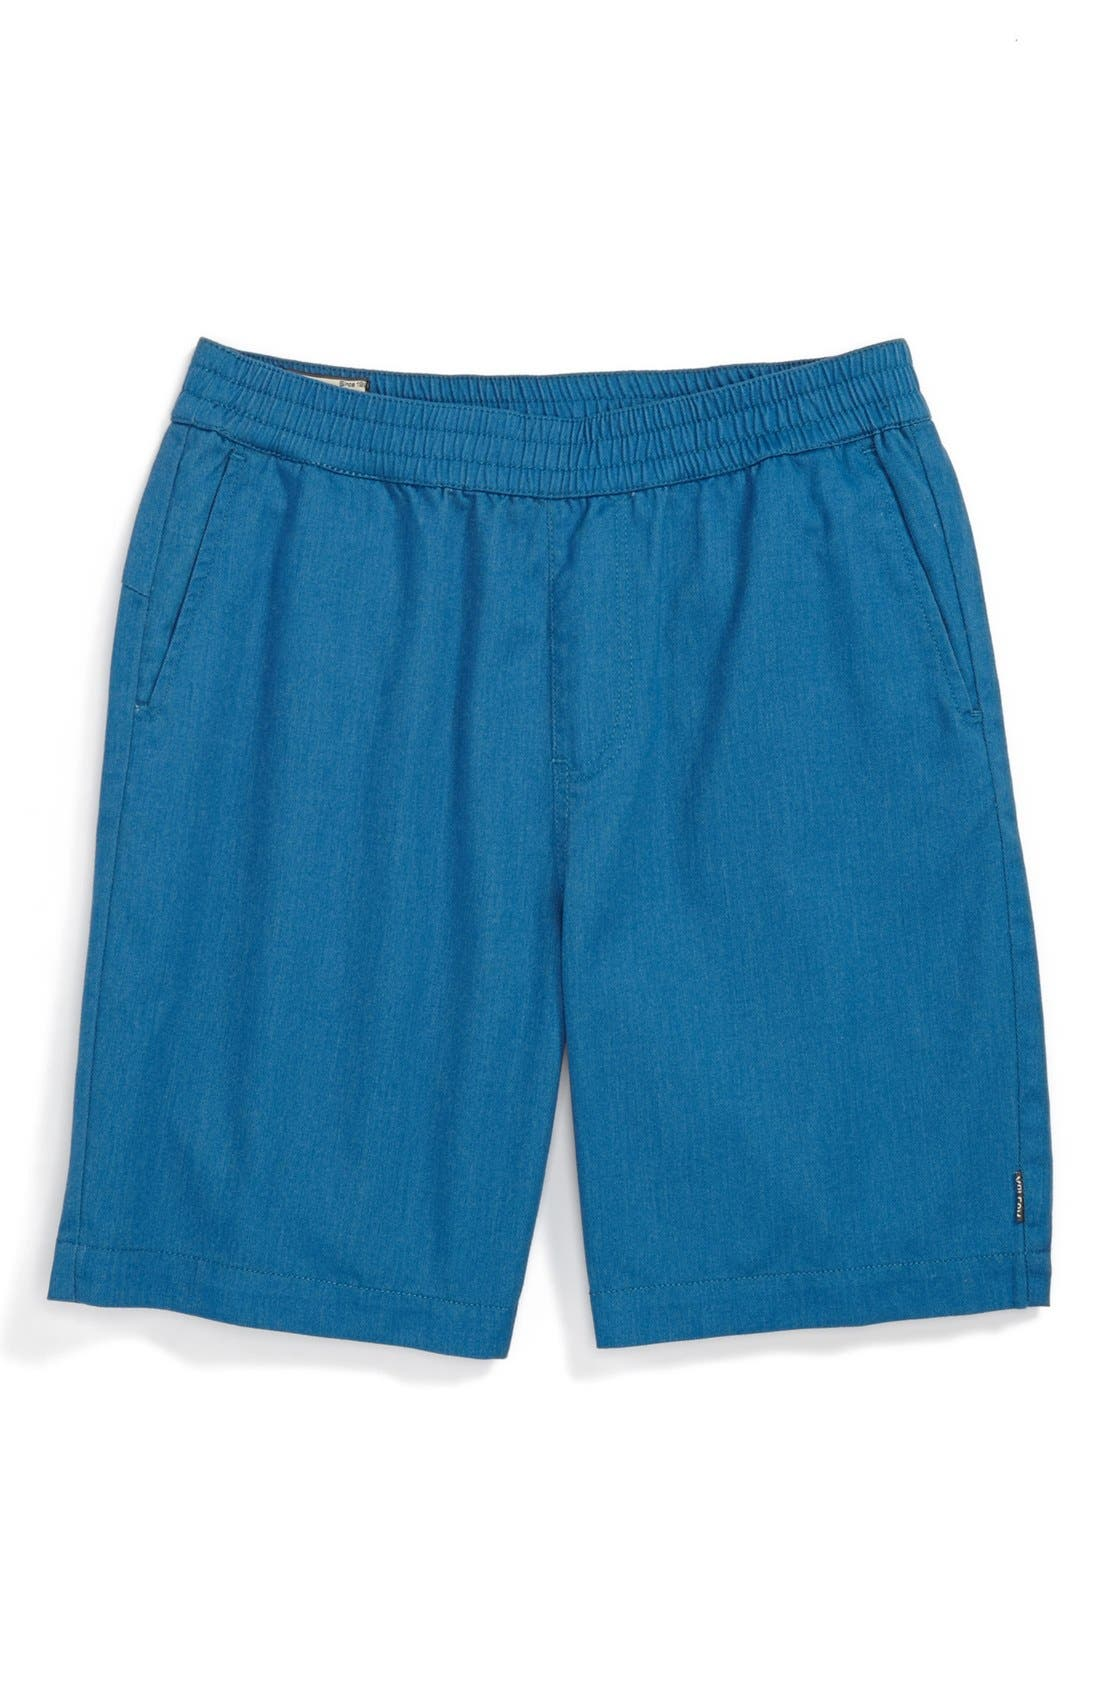 Alternate Image 1 Selected - Volcom Twill Shorts (Big Boys)